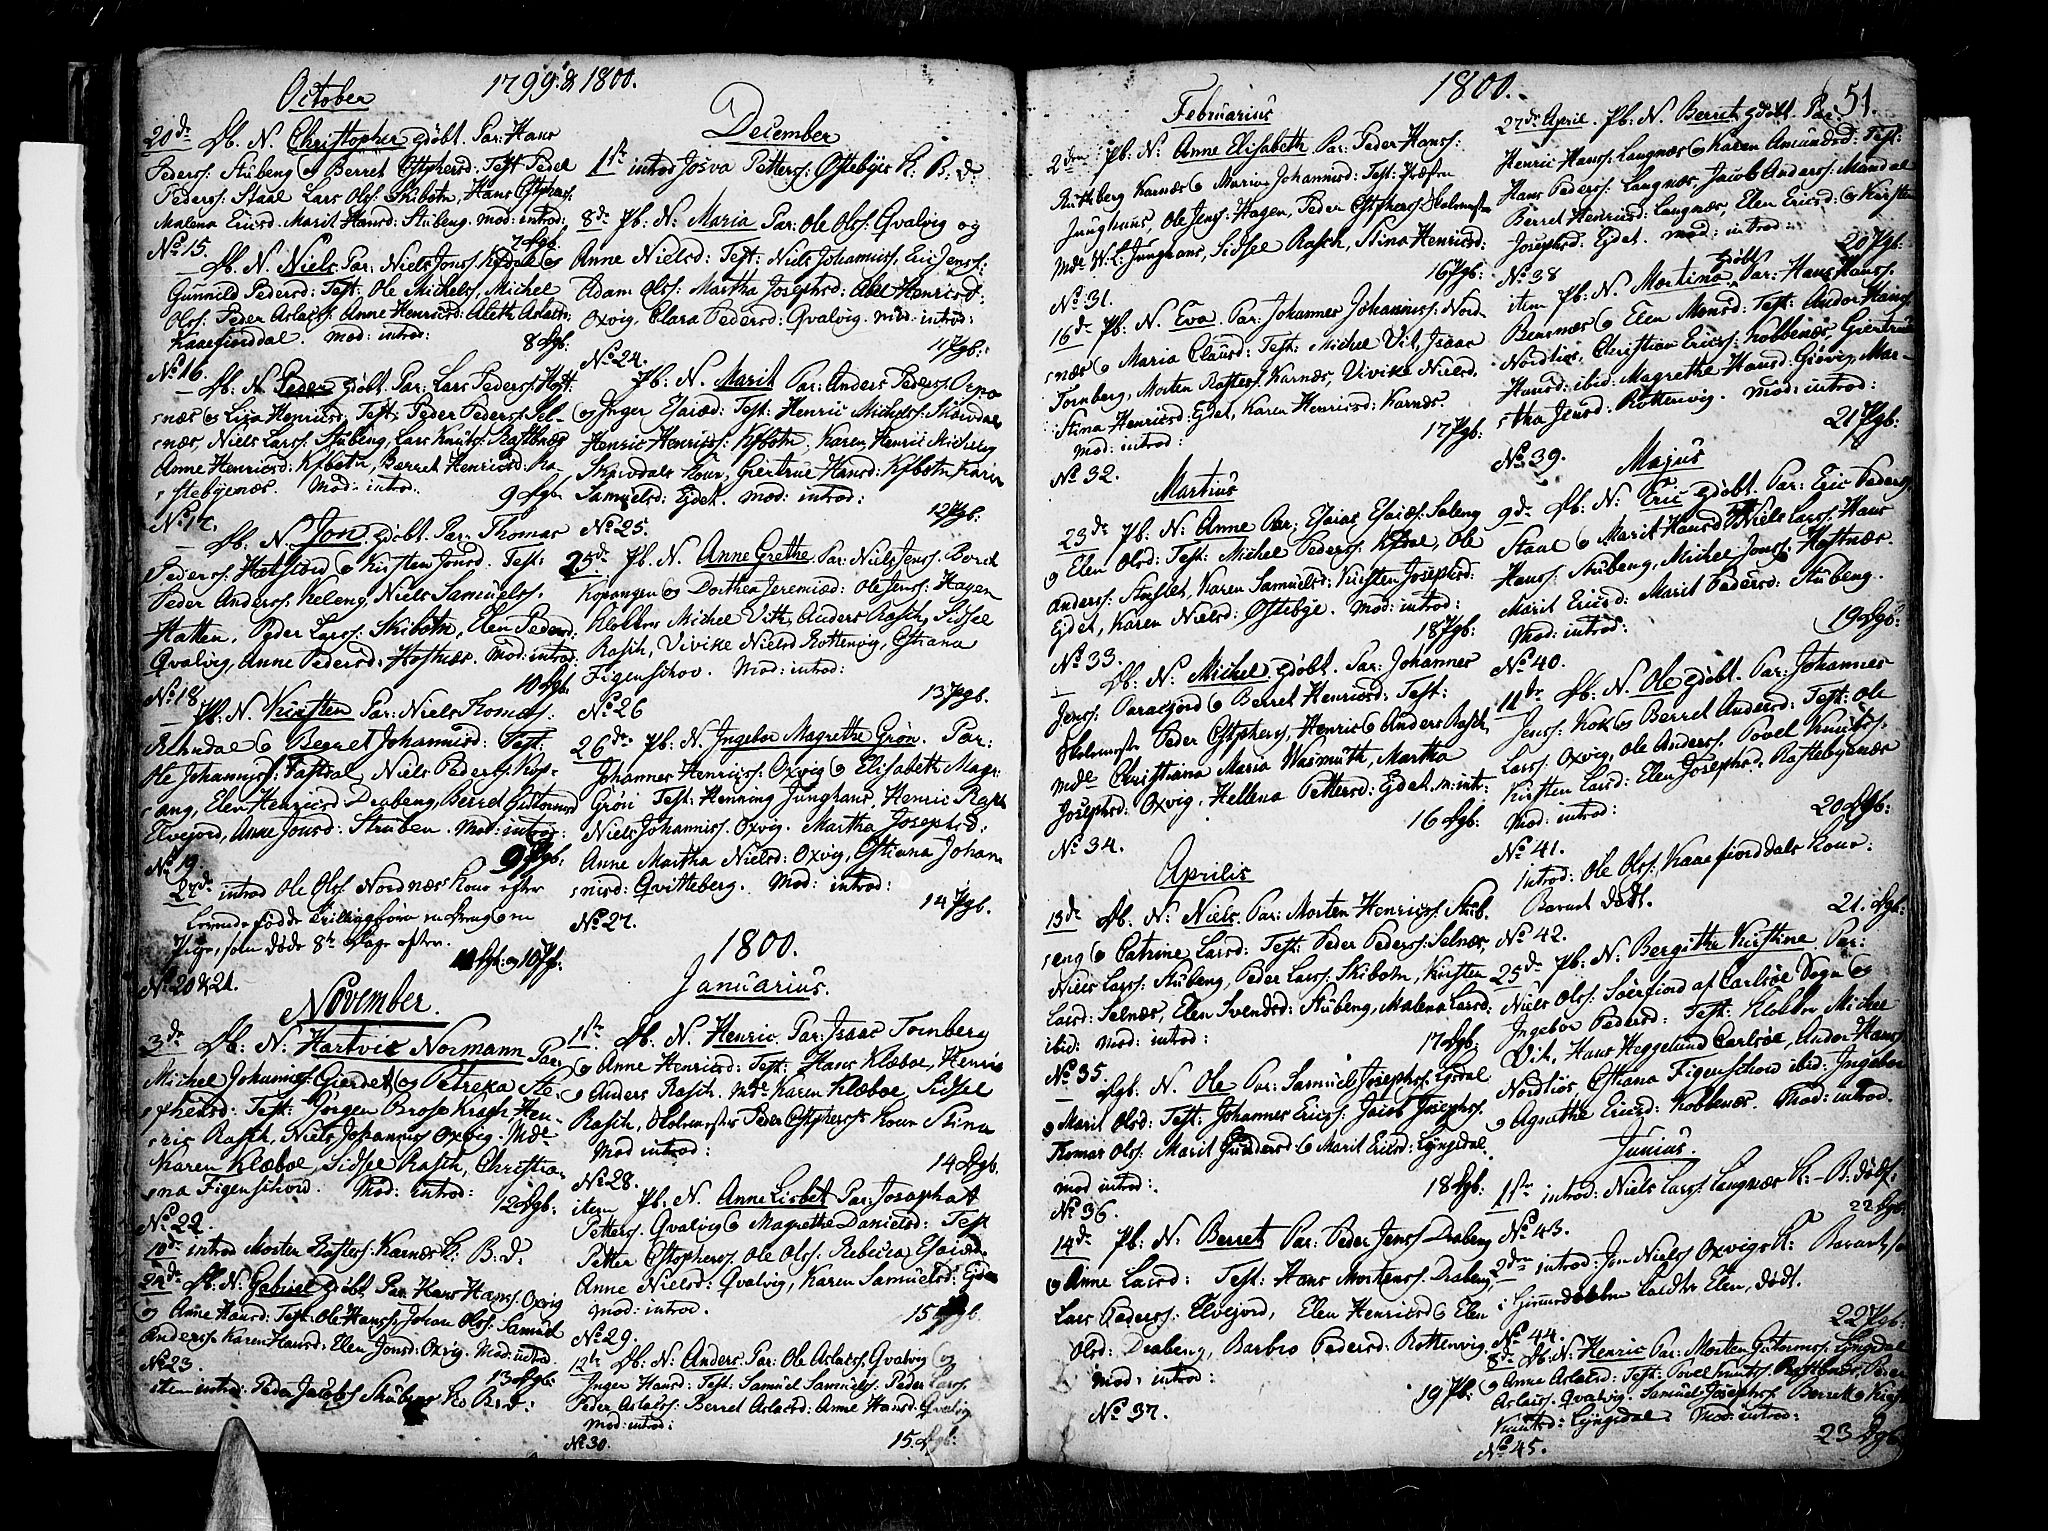 SATØ, Lyngen sokneprestembete, Ministerialbok nr. 2, 1785-1840, s. 51